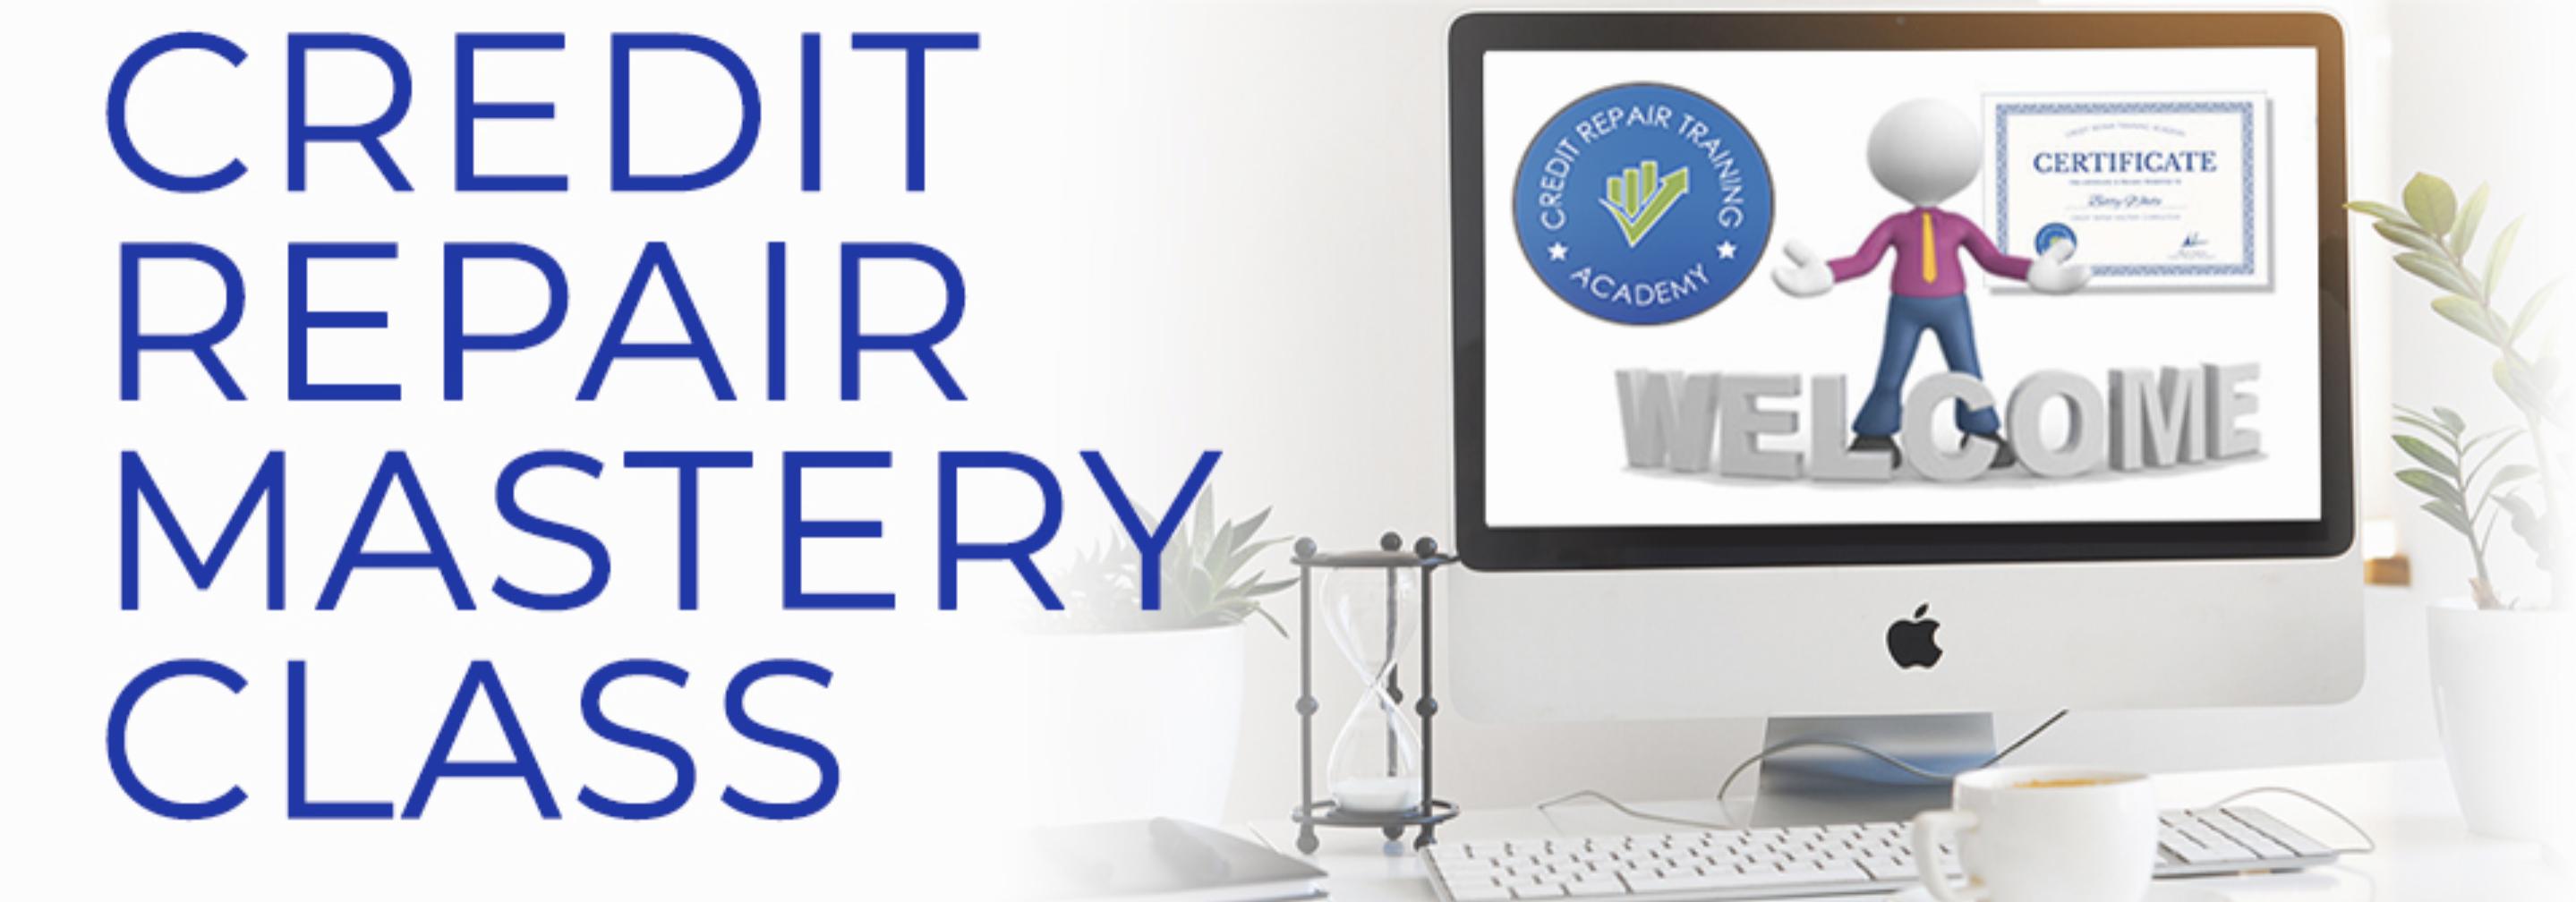 credit repair business mastery class